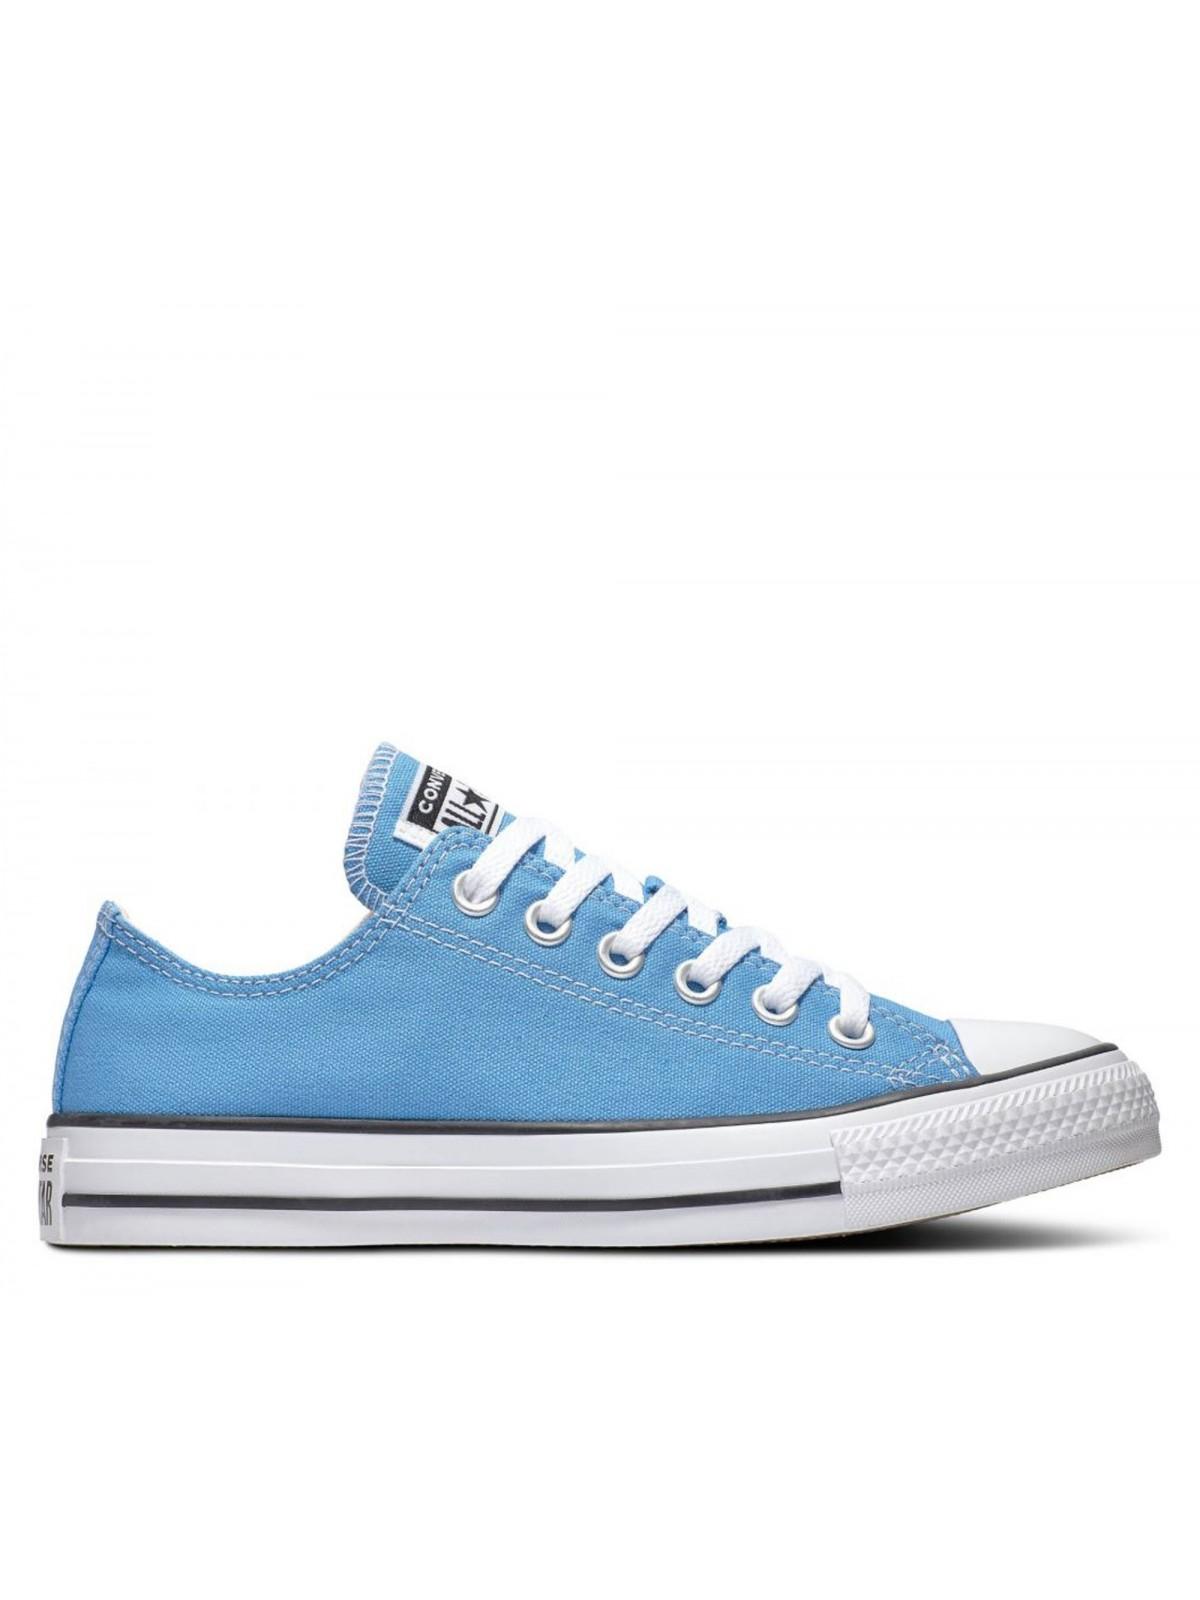 converse basse bleue